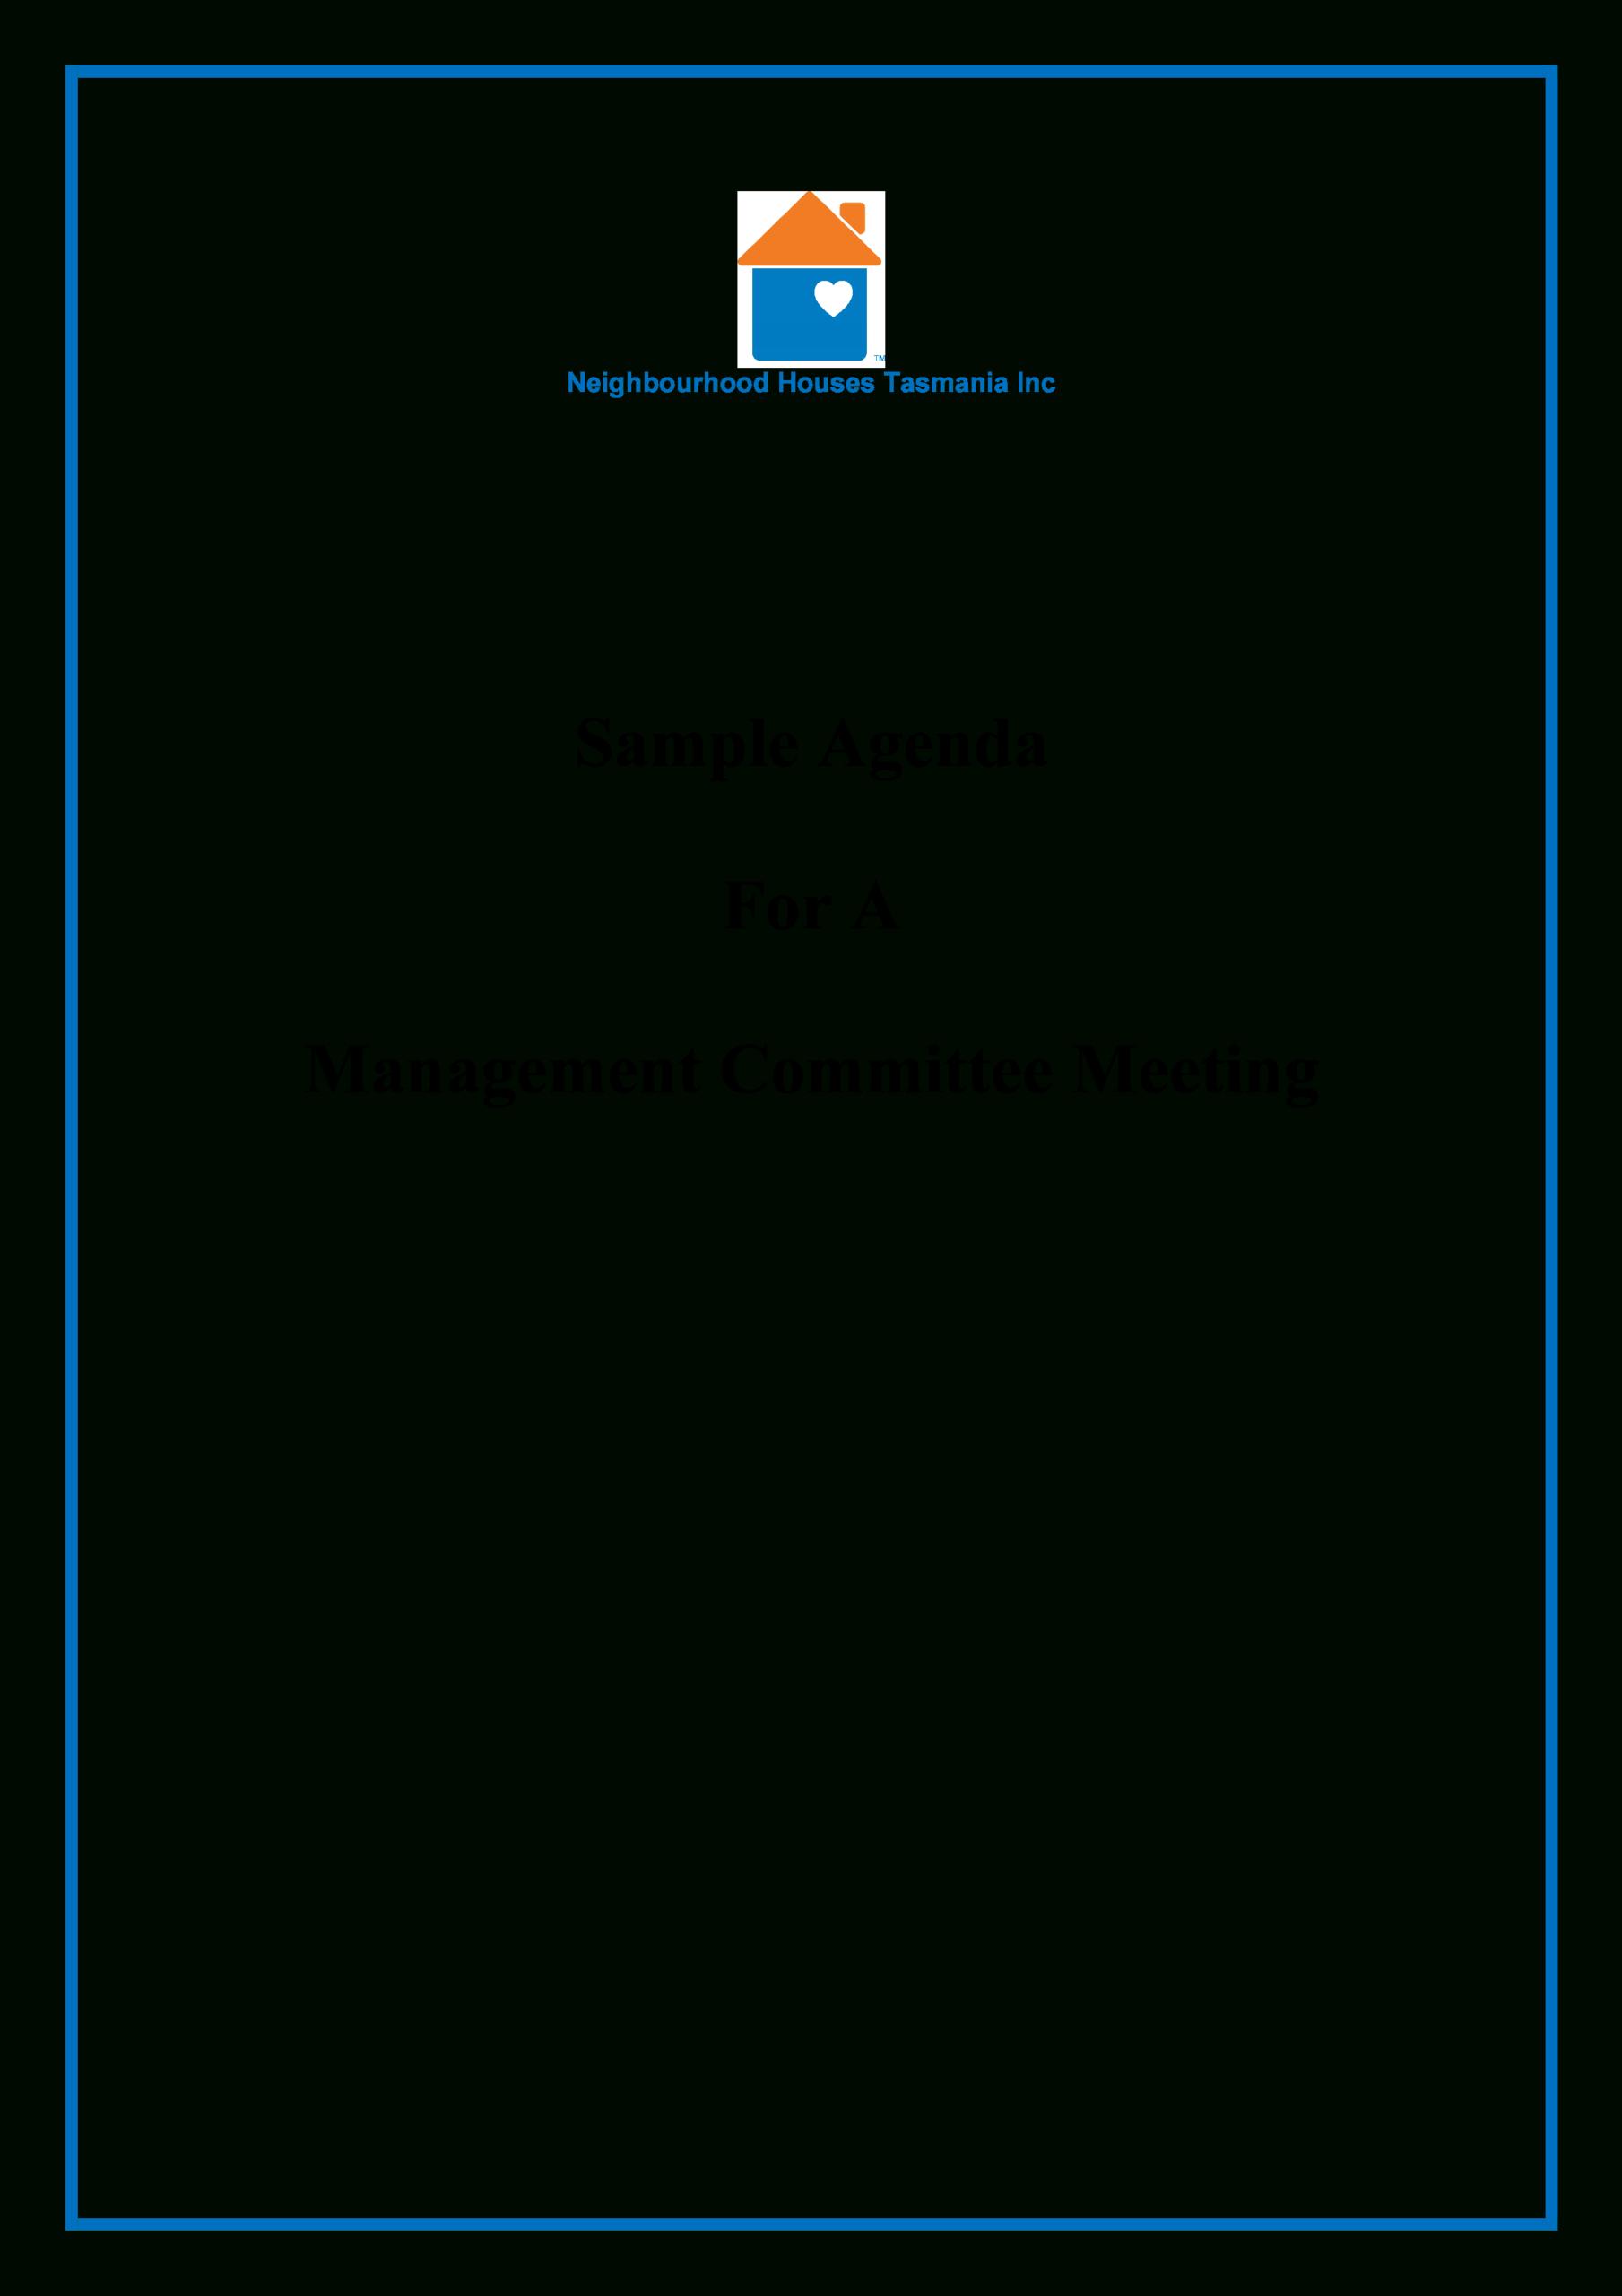 Committee Management Meeting Agenda | Templates At Pertaining To Committee Meeting Agenda Template